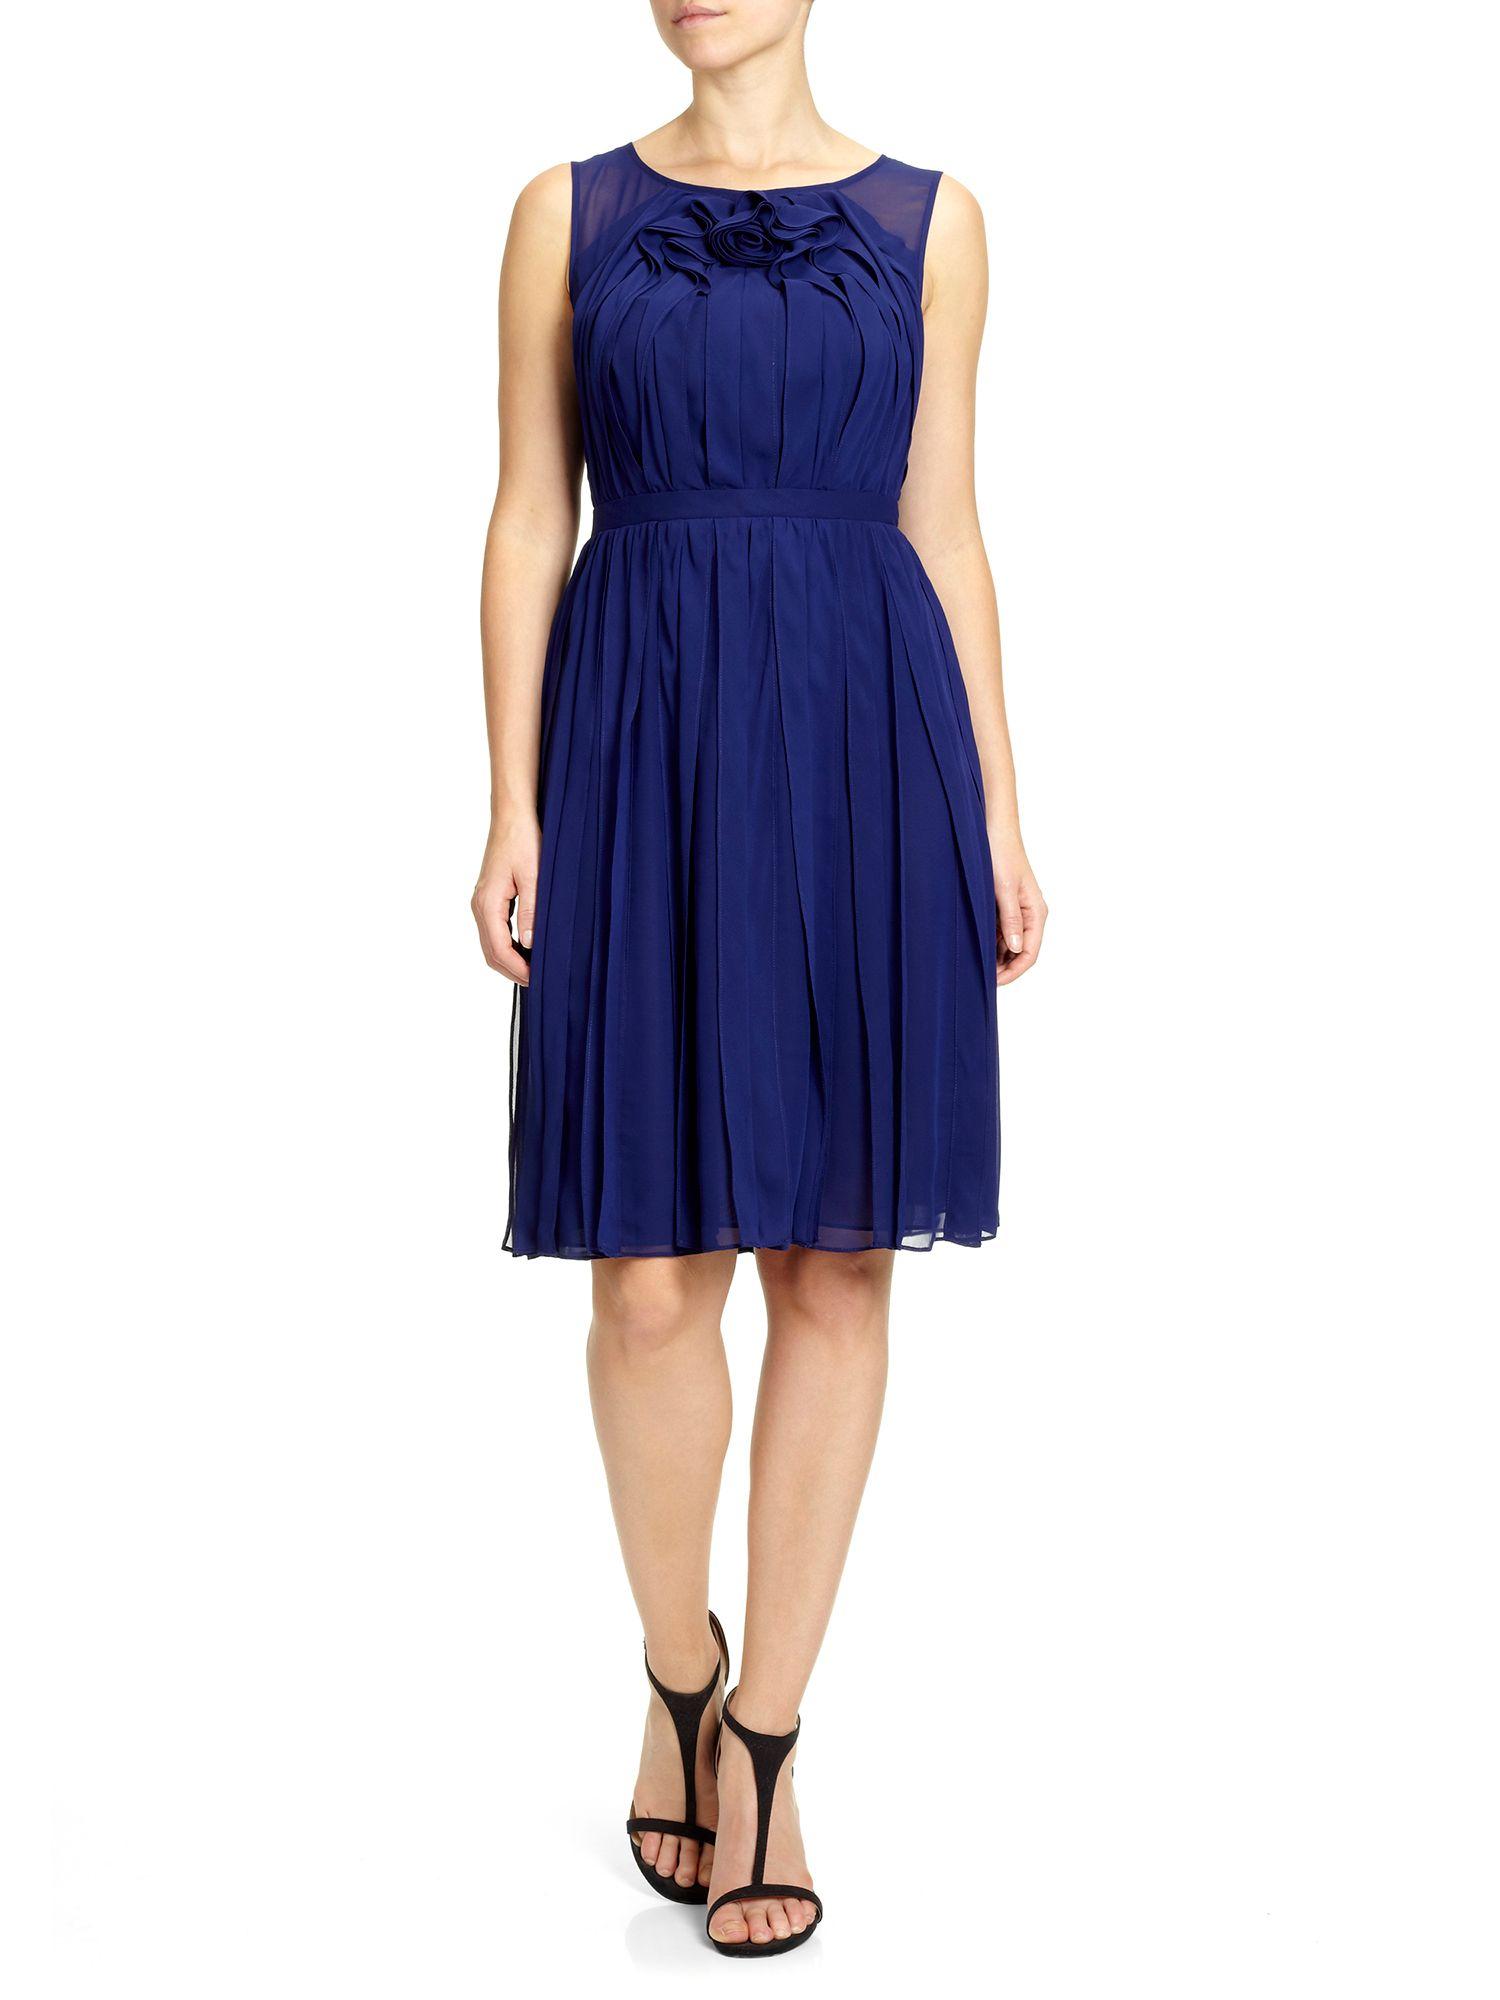 Adrianna papell Sleeveless Rosette Prom Dress in Blue  Lyst